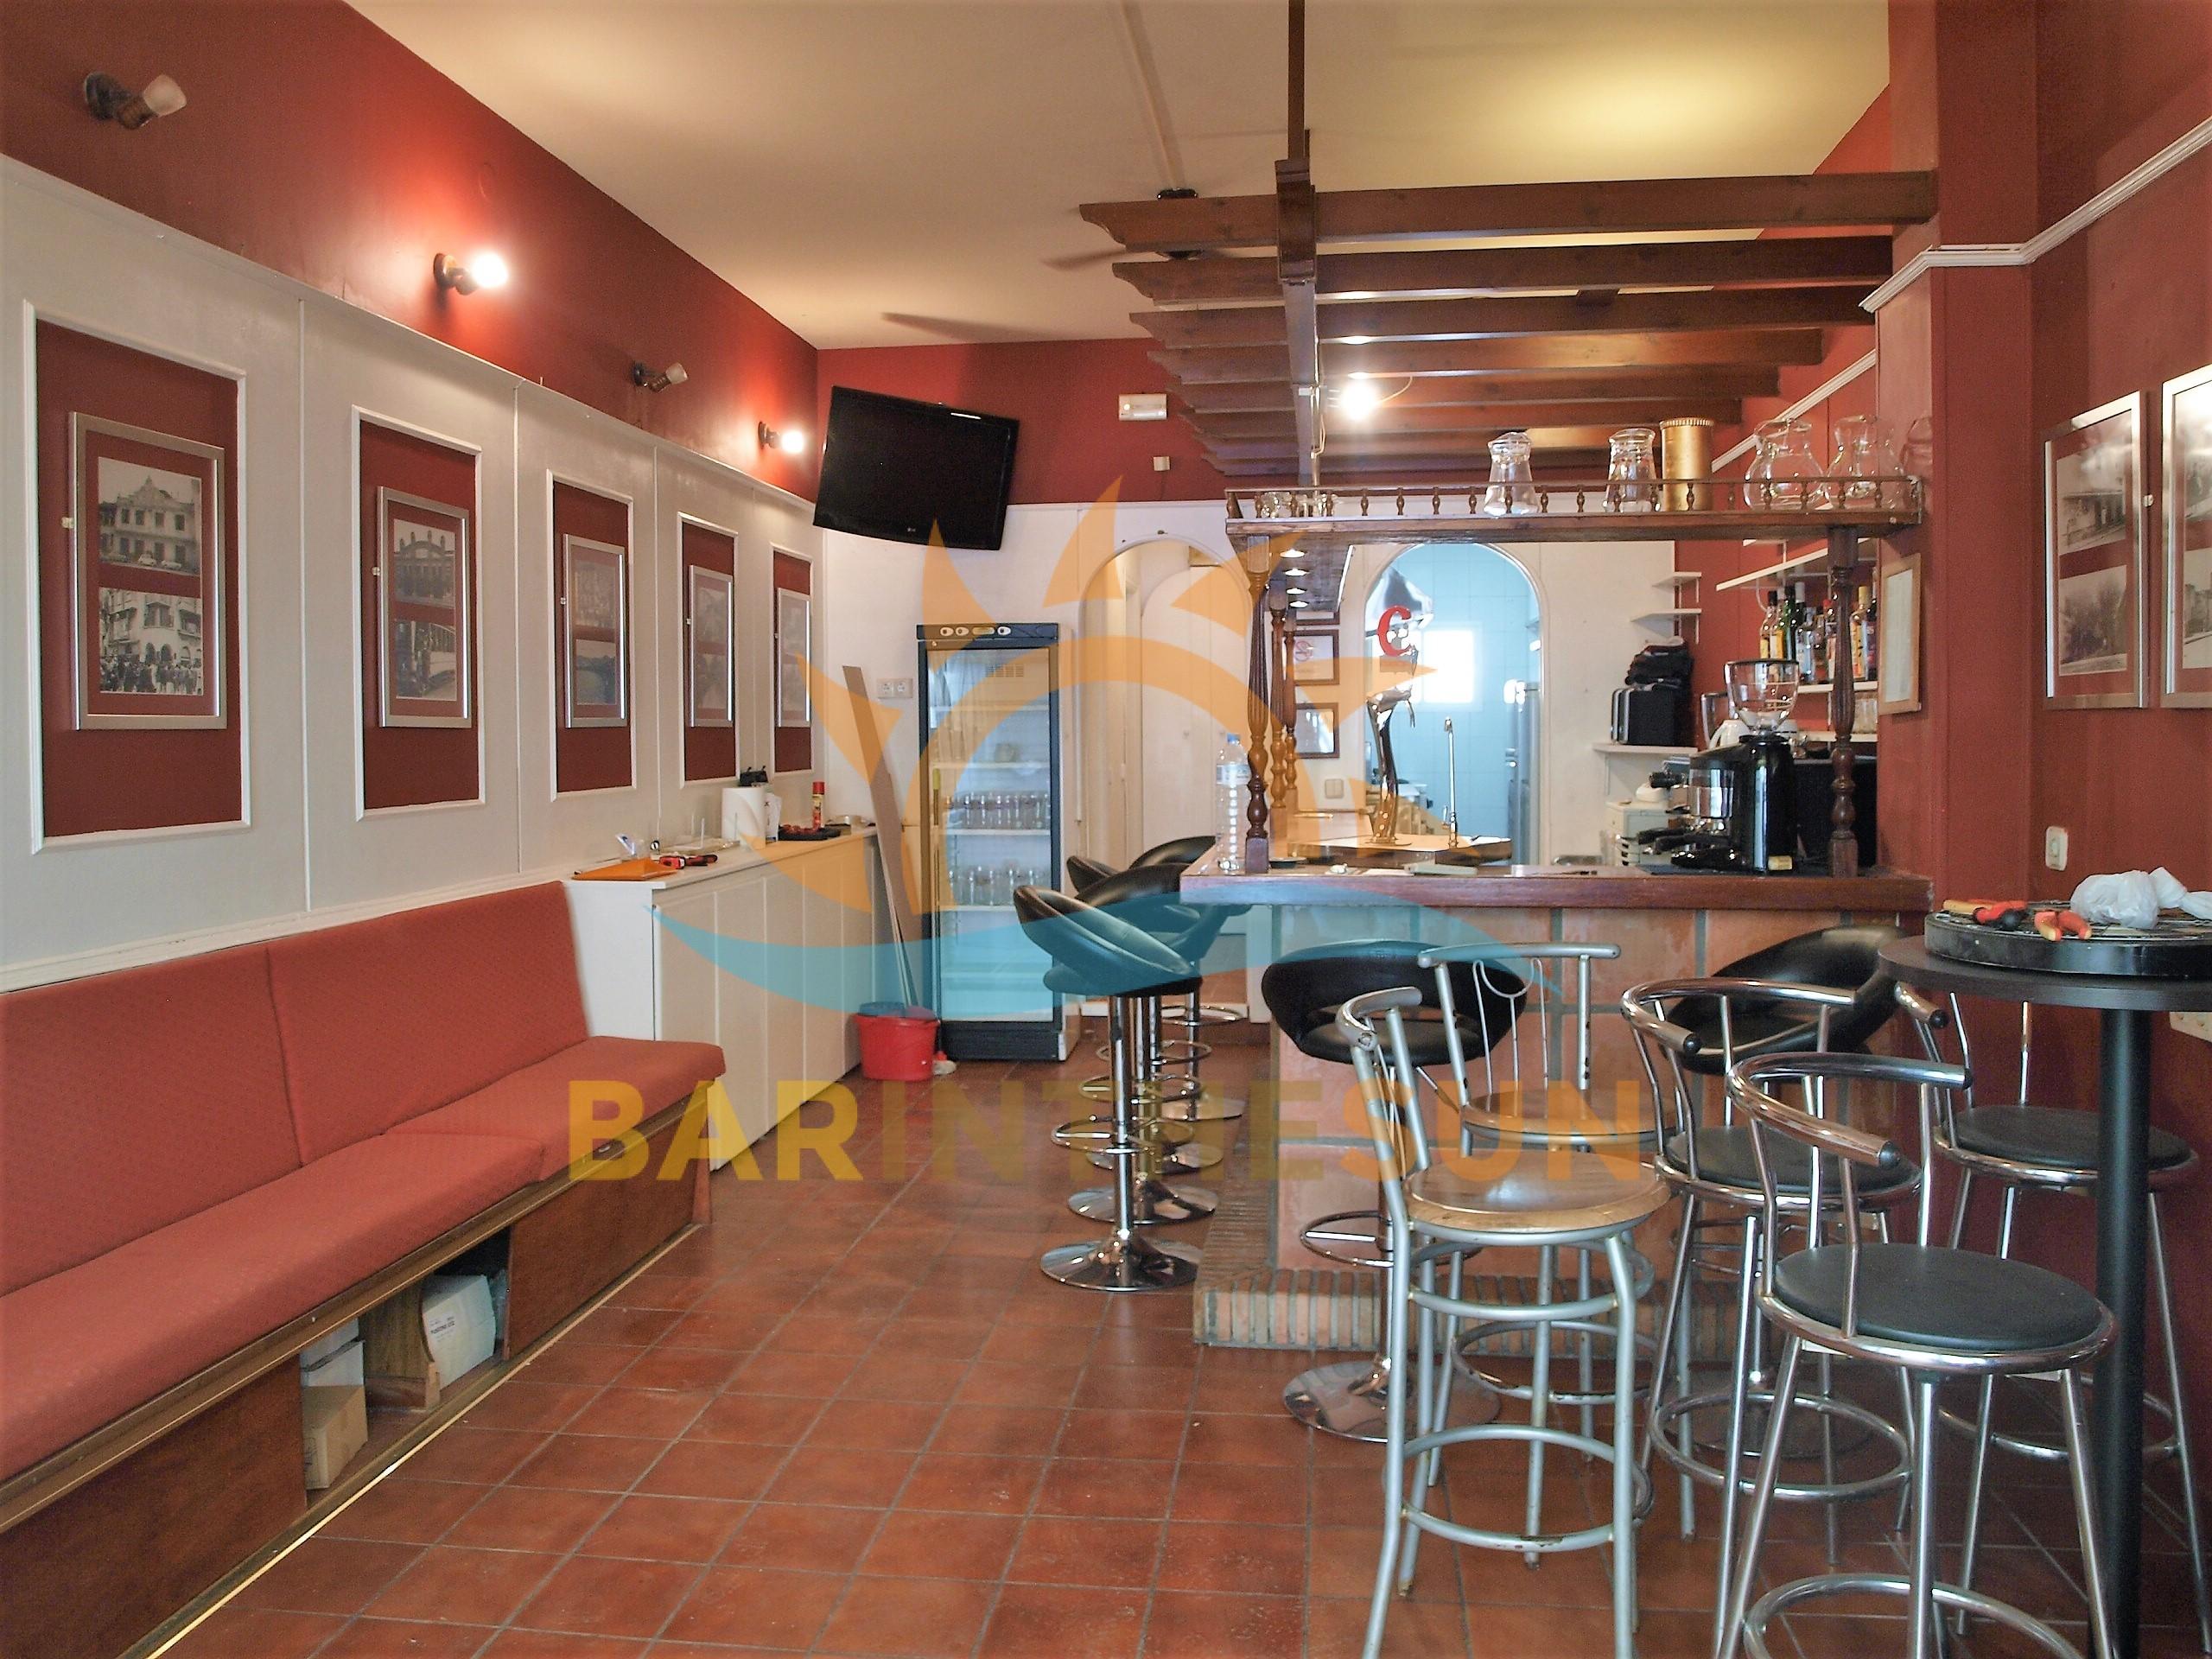 Arroyo De La Miel Cafe Bars For Sale, Bars For Sale in Spain